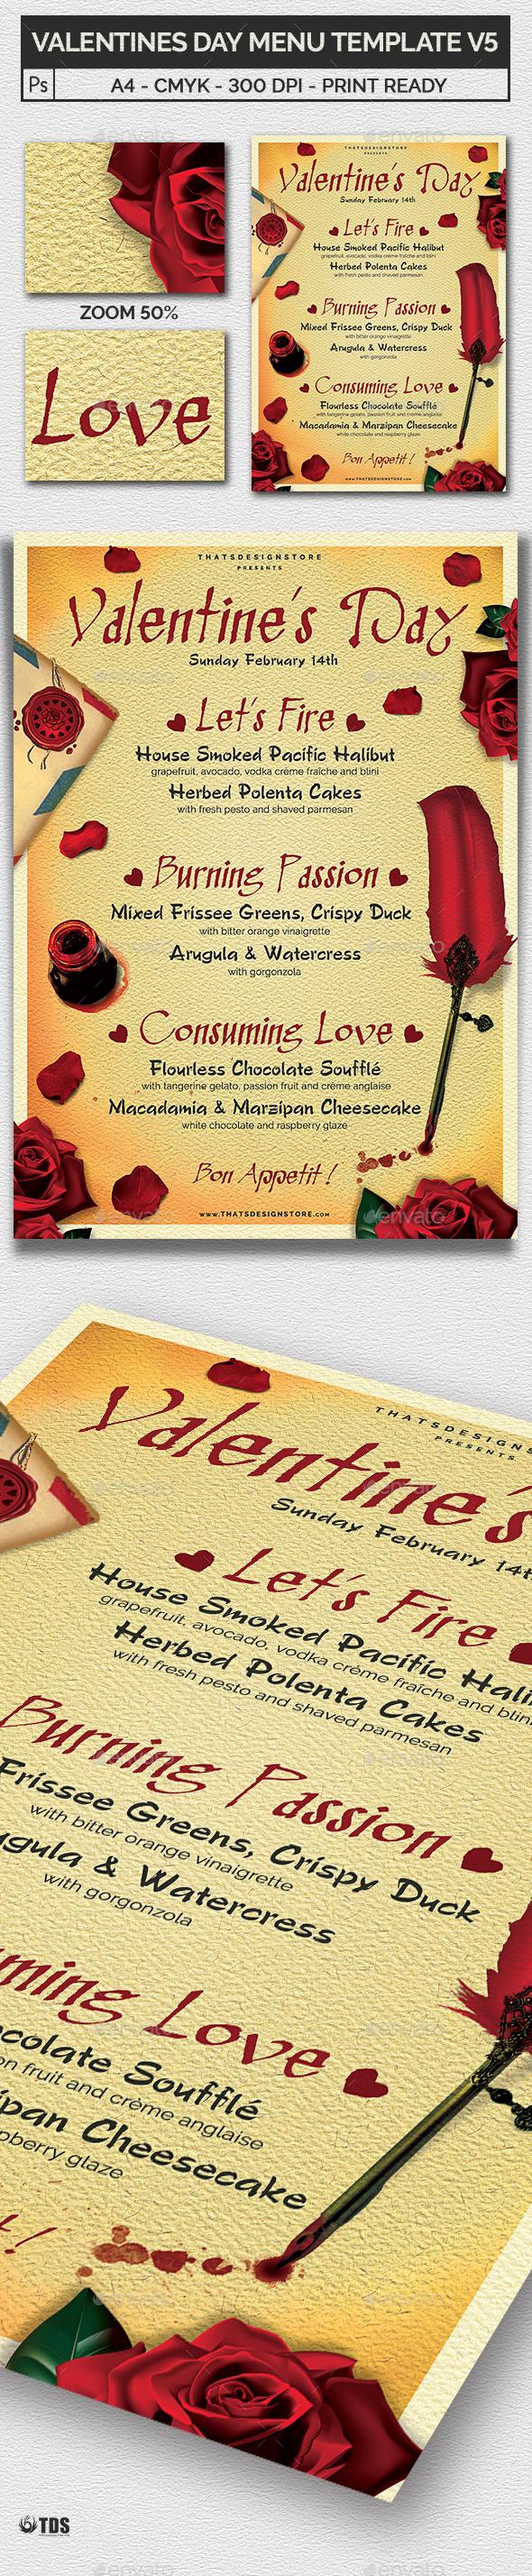 Valentines Day Menu Template V5 - Restaurant Flyers